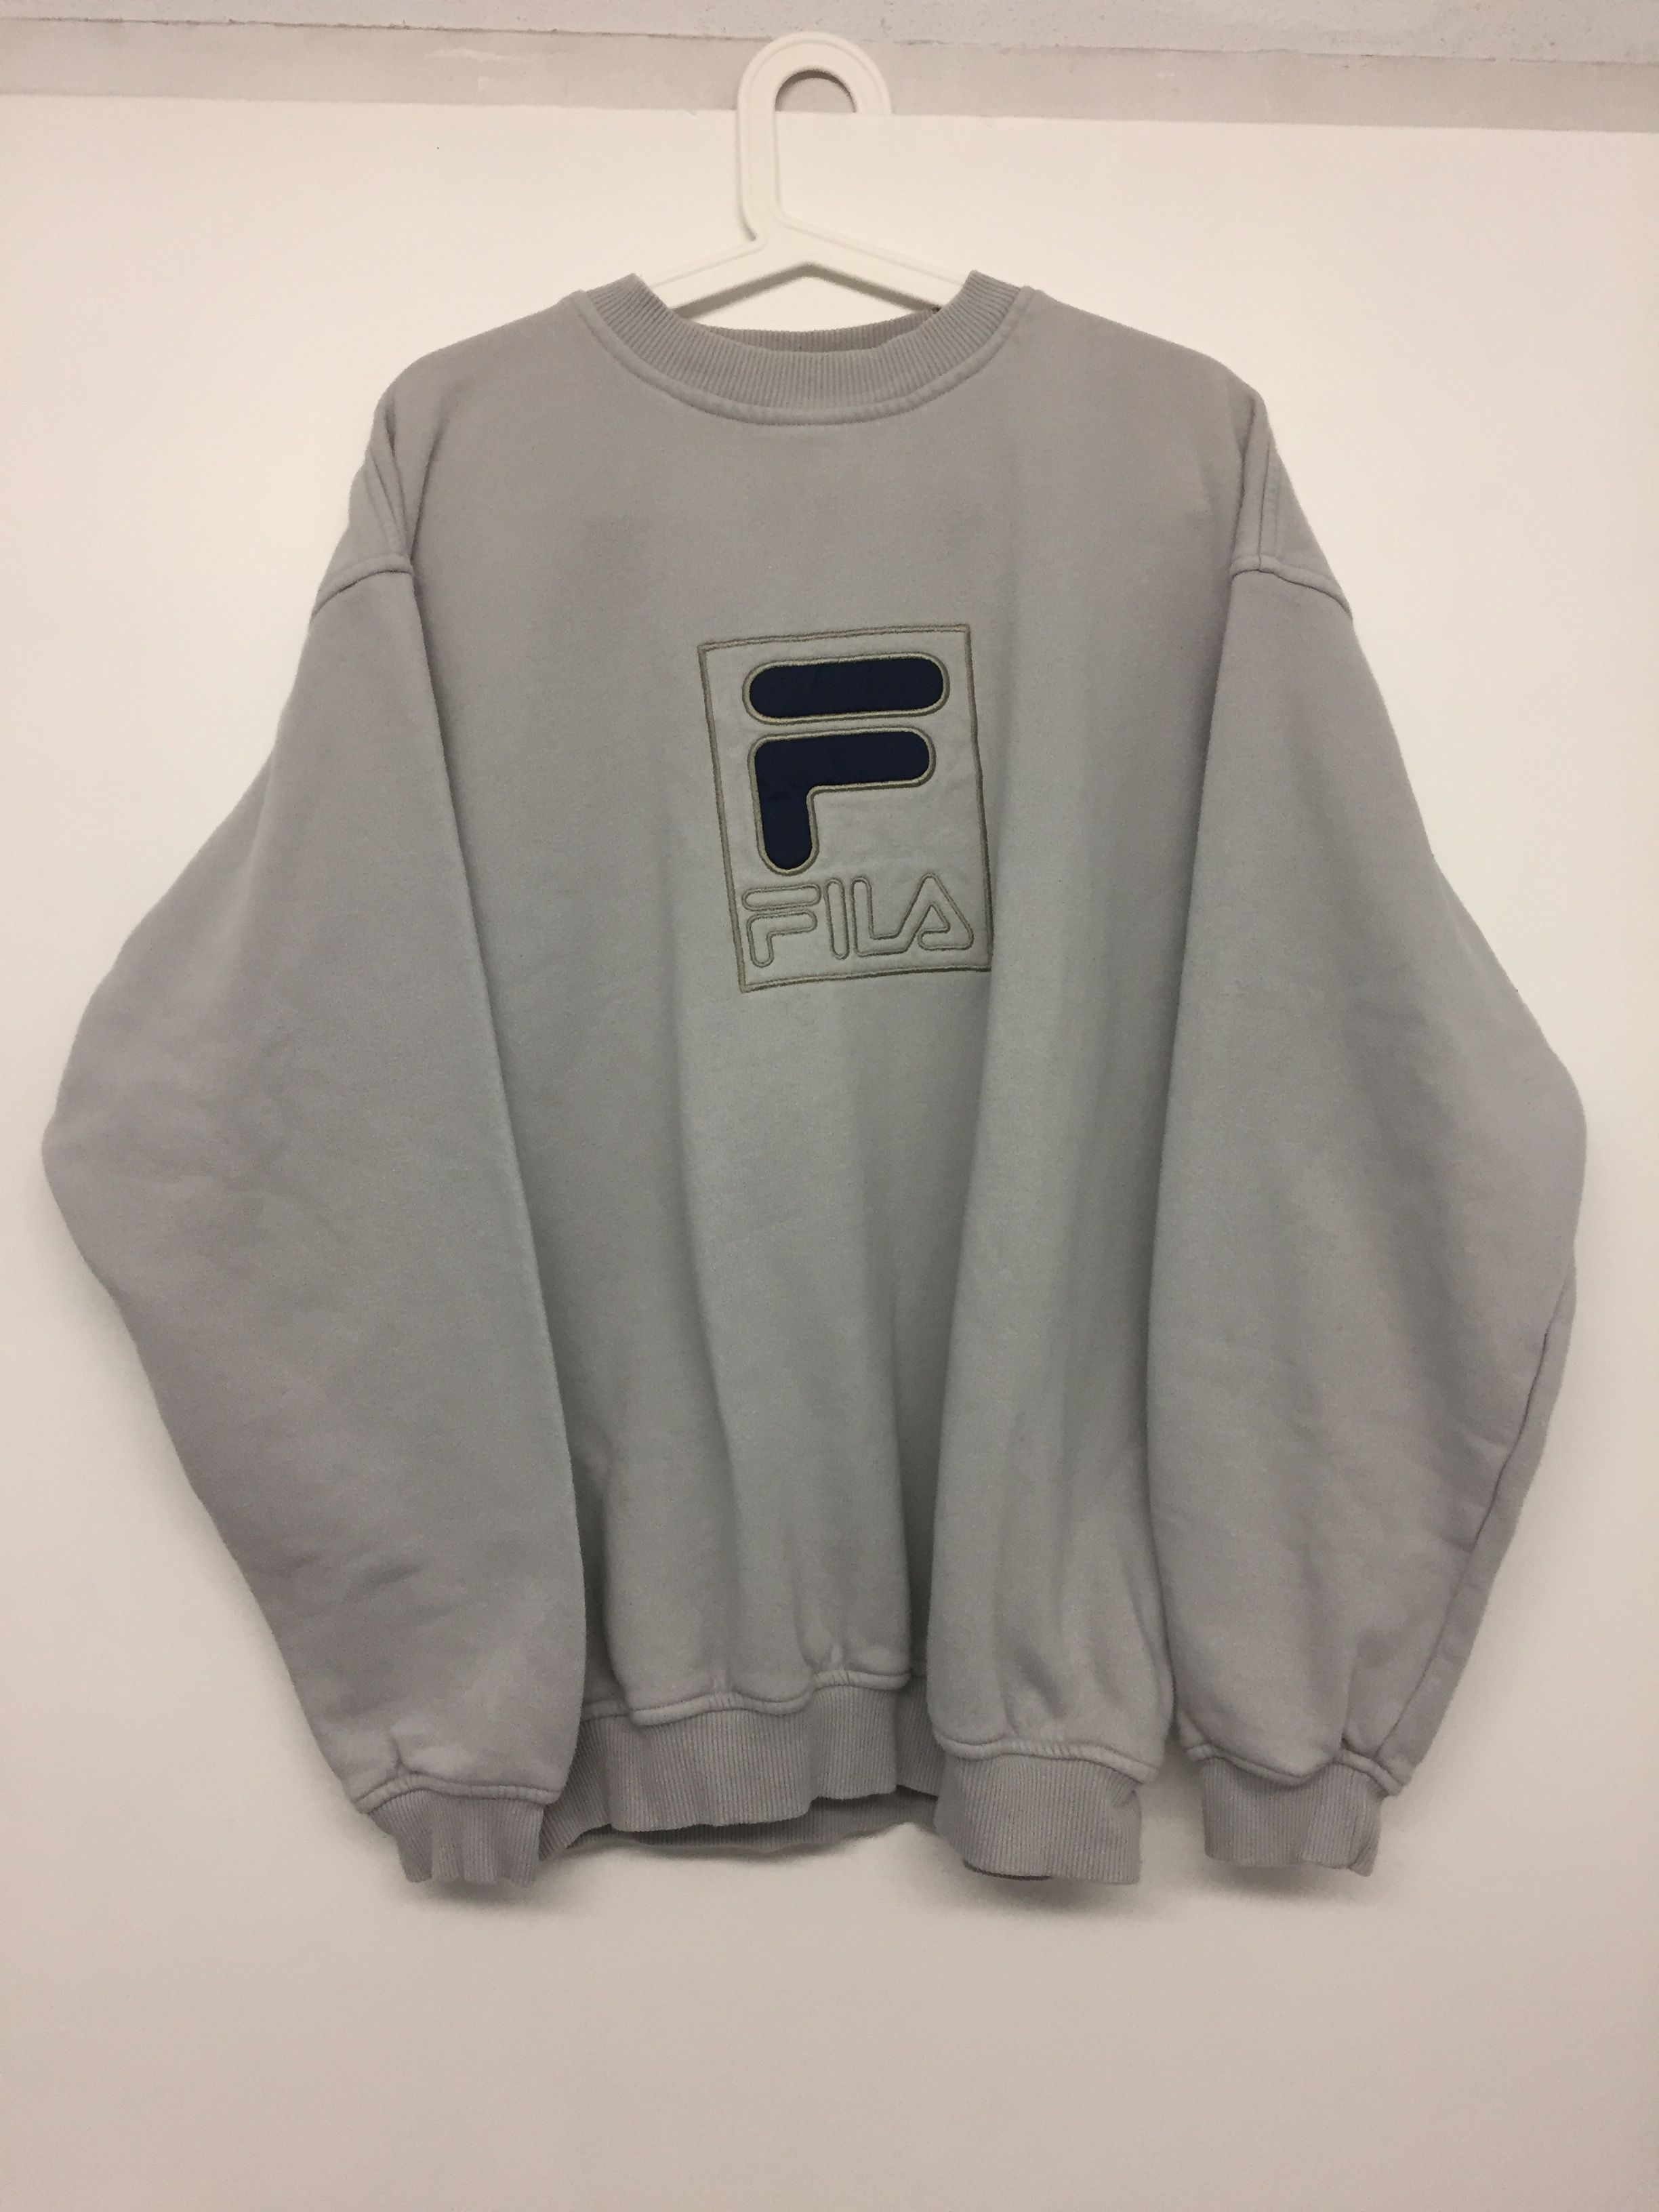 Vintage Fila Sweatshirt Gr. L Condition 910 40€ | CHRISTMAS